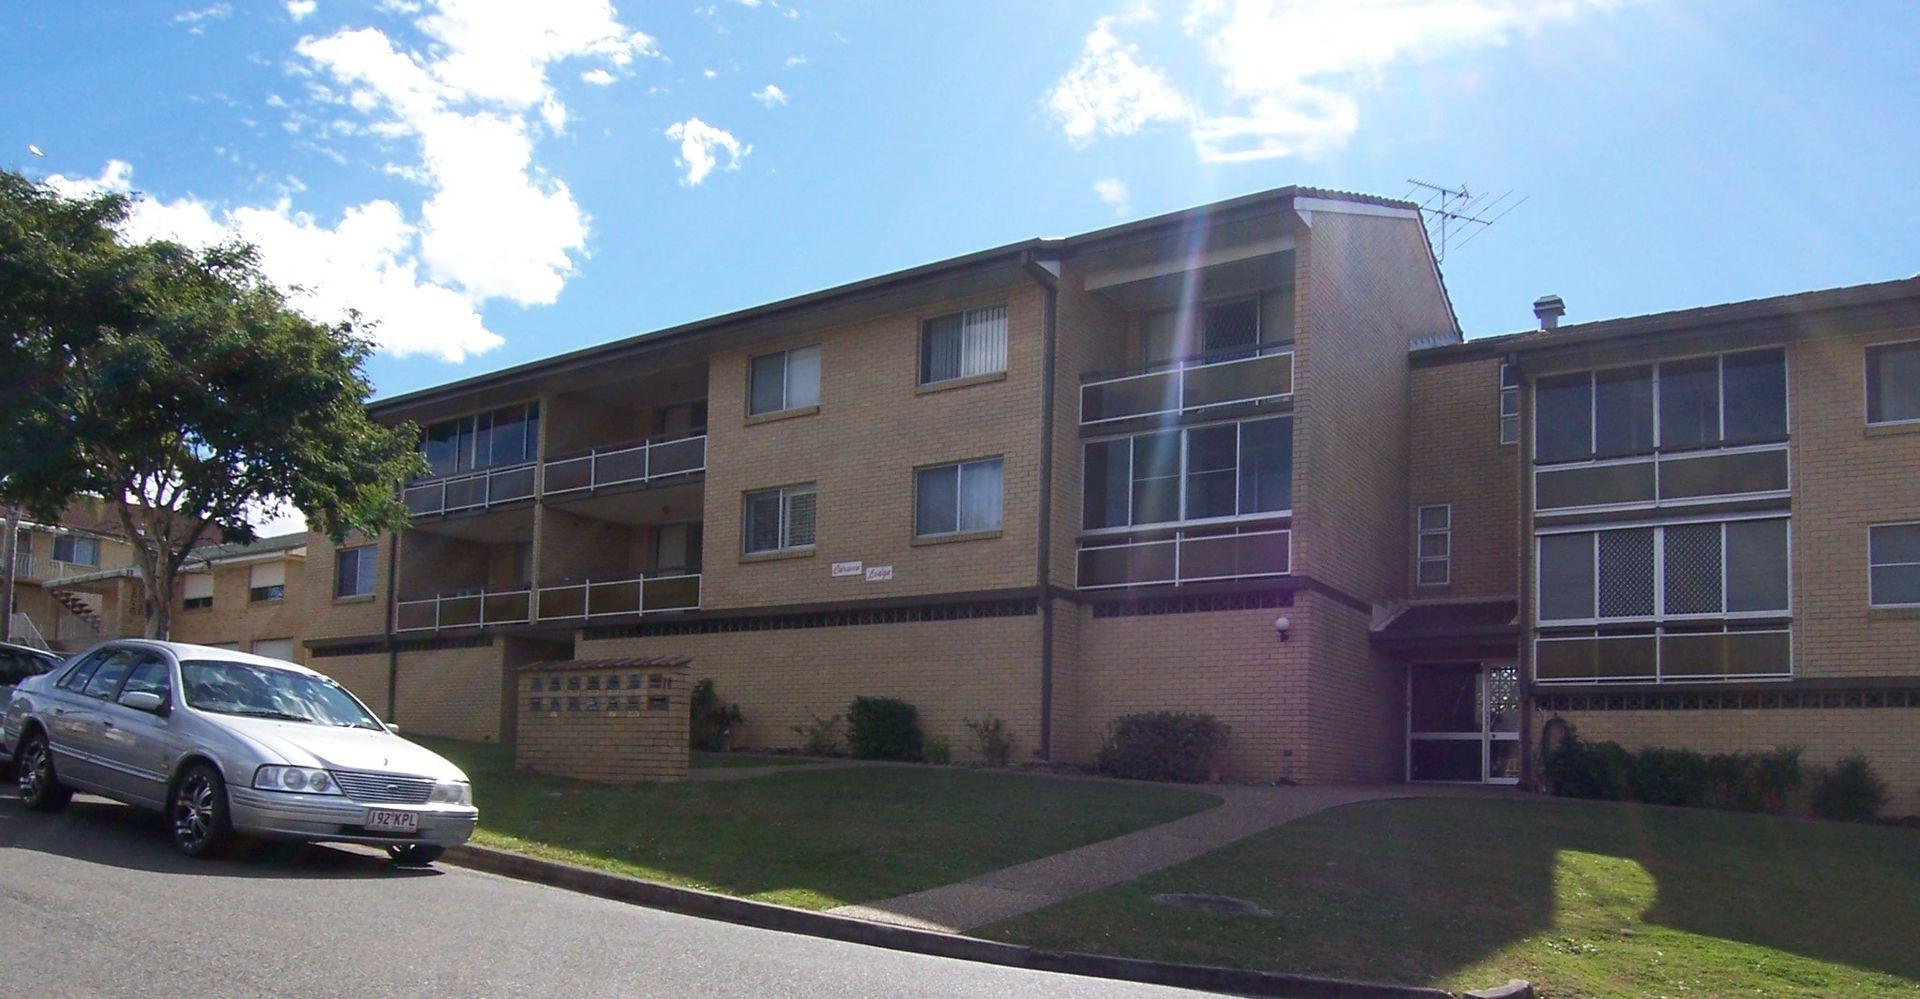 5/78 Curwen Terrace, Chermside QLD 4032, Image 0